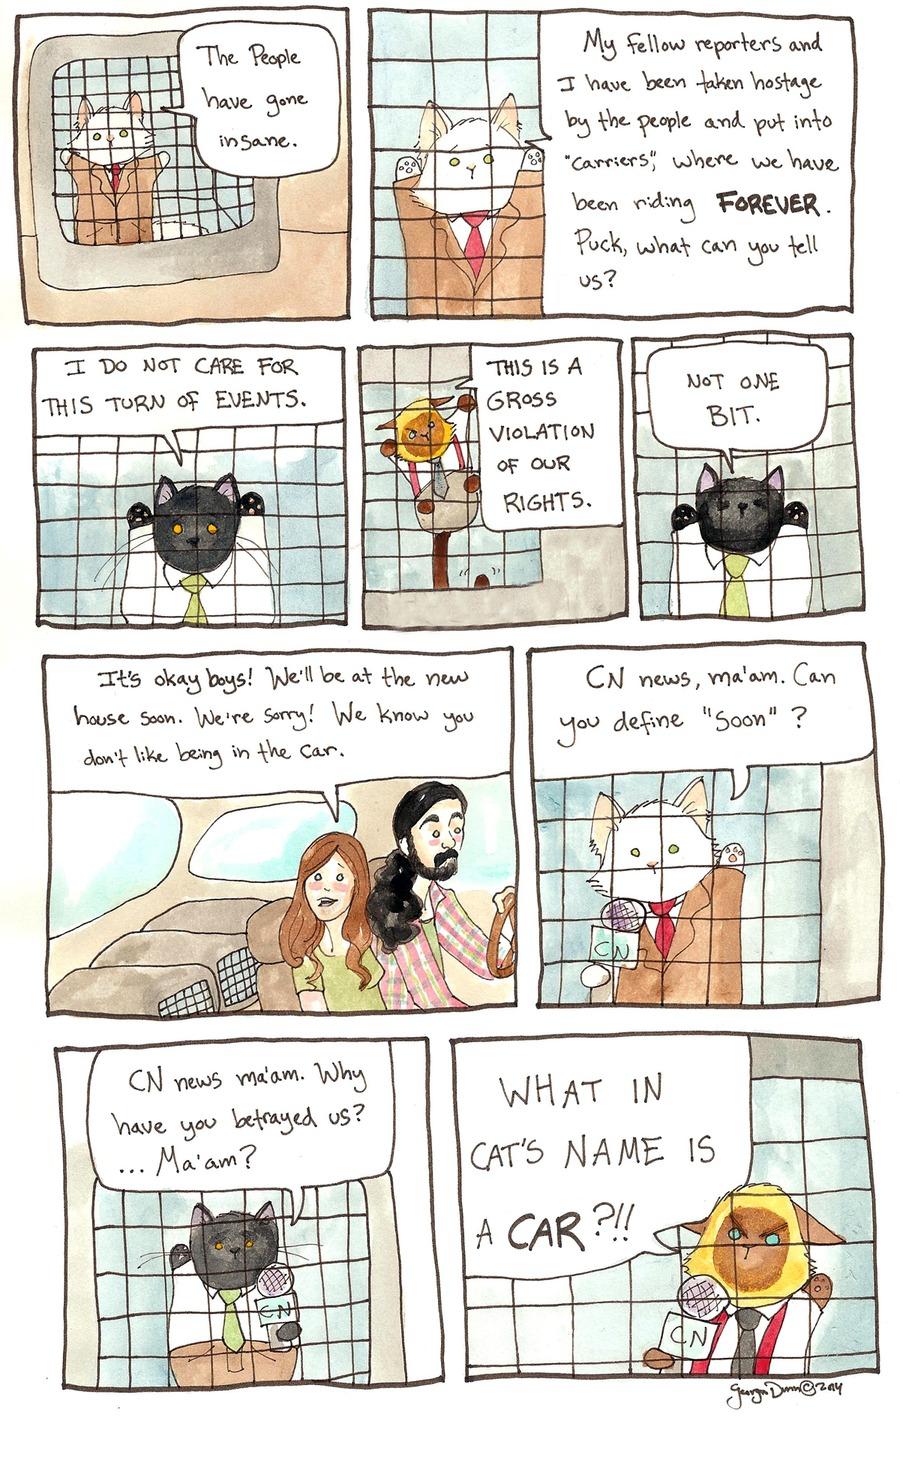 Breaking Cat News for Sep 11, 2016 Comic Strip